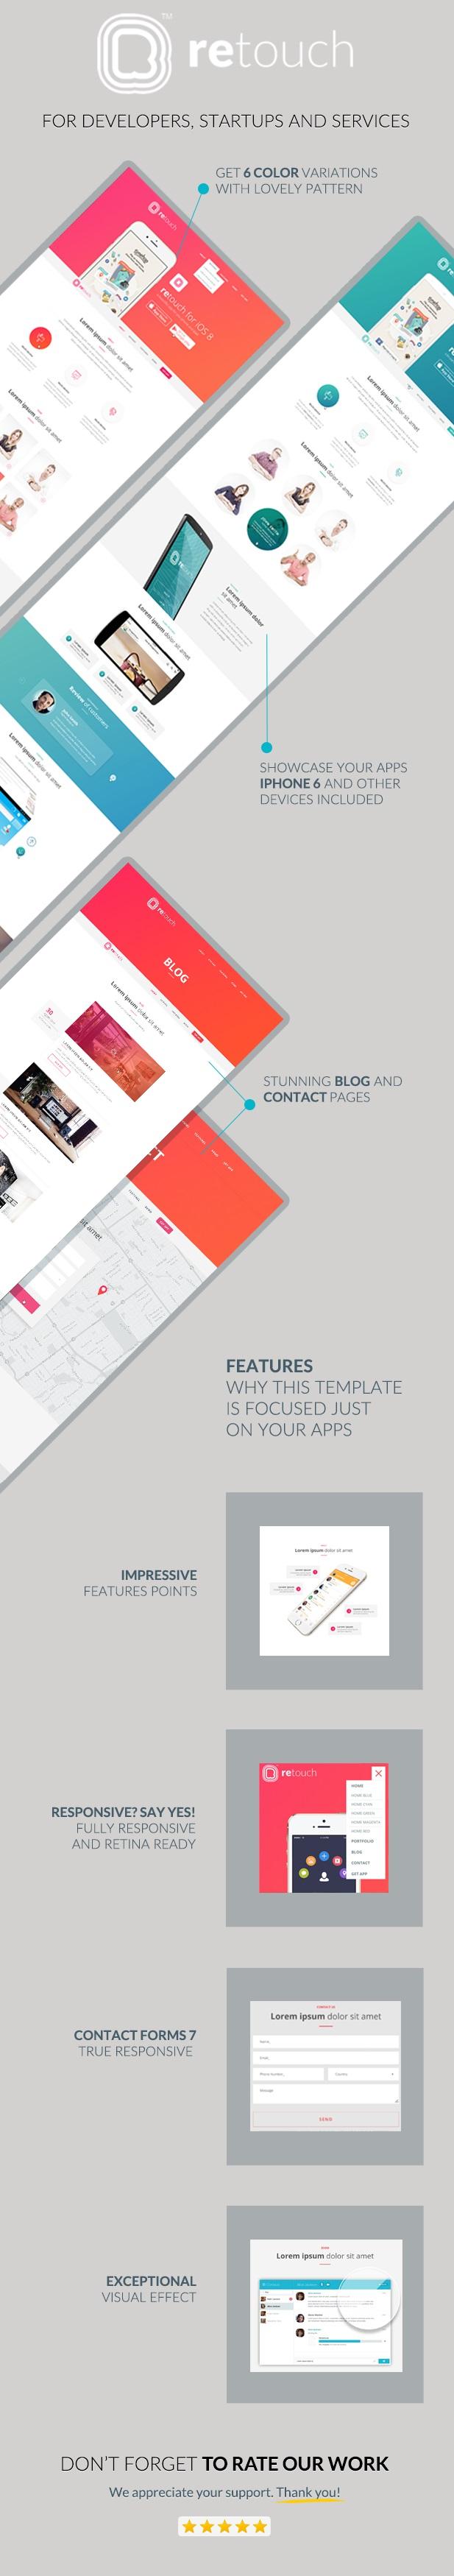 ReTouch - Mobile App MuraCMS theme - 1